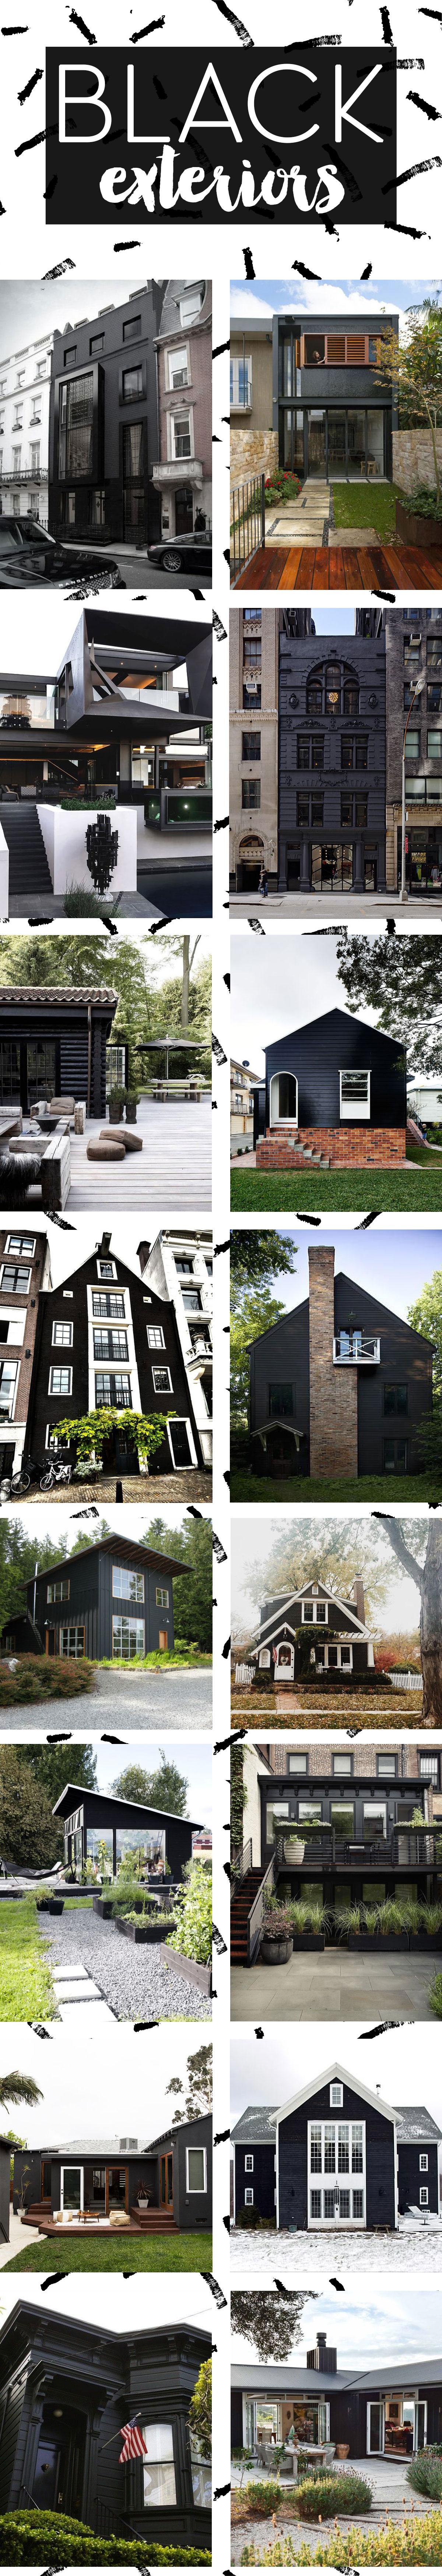 Black_home_exteriors_blackband_design